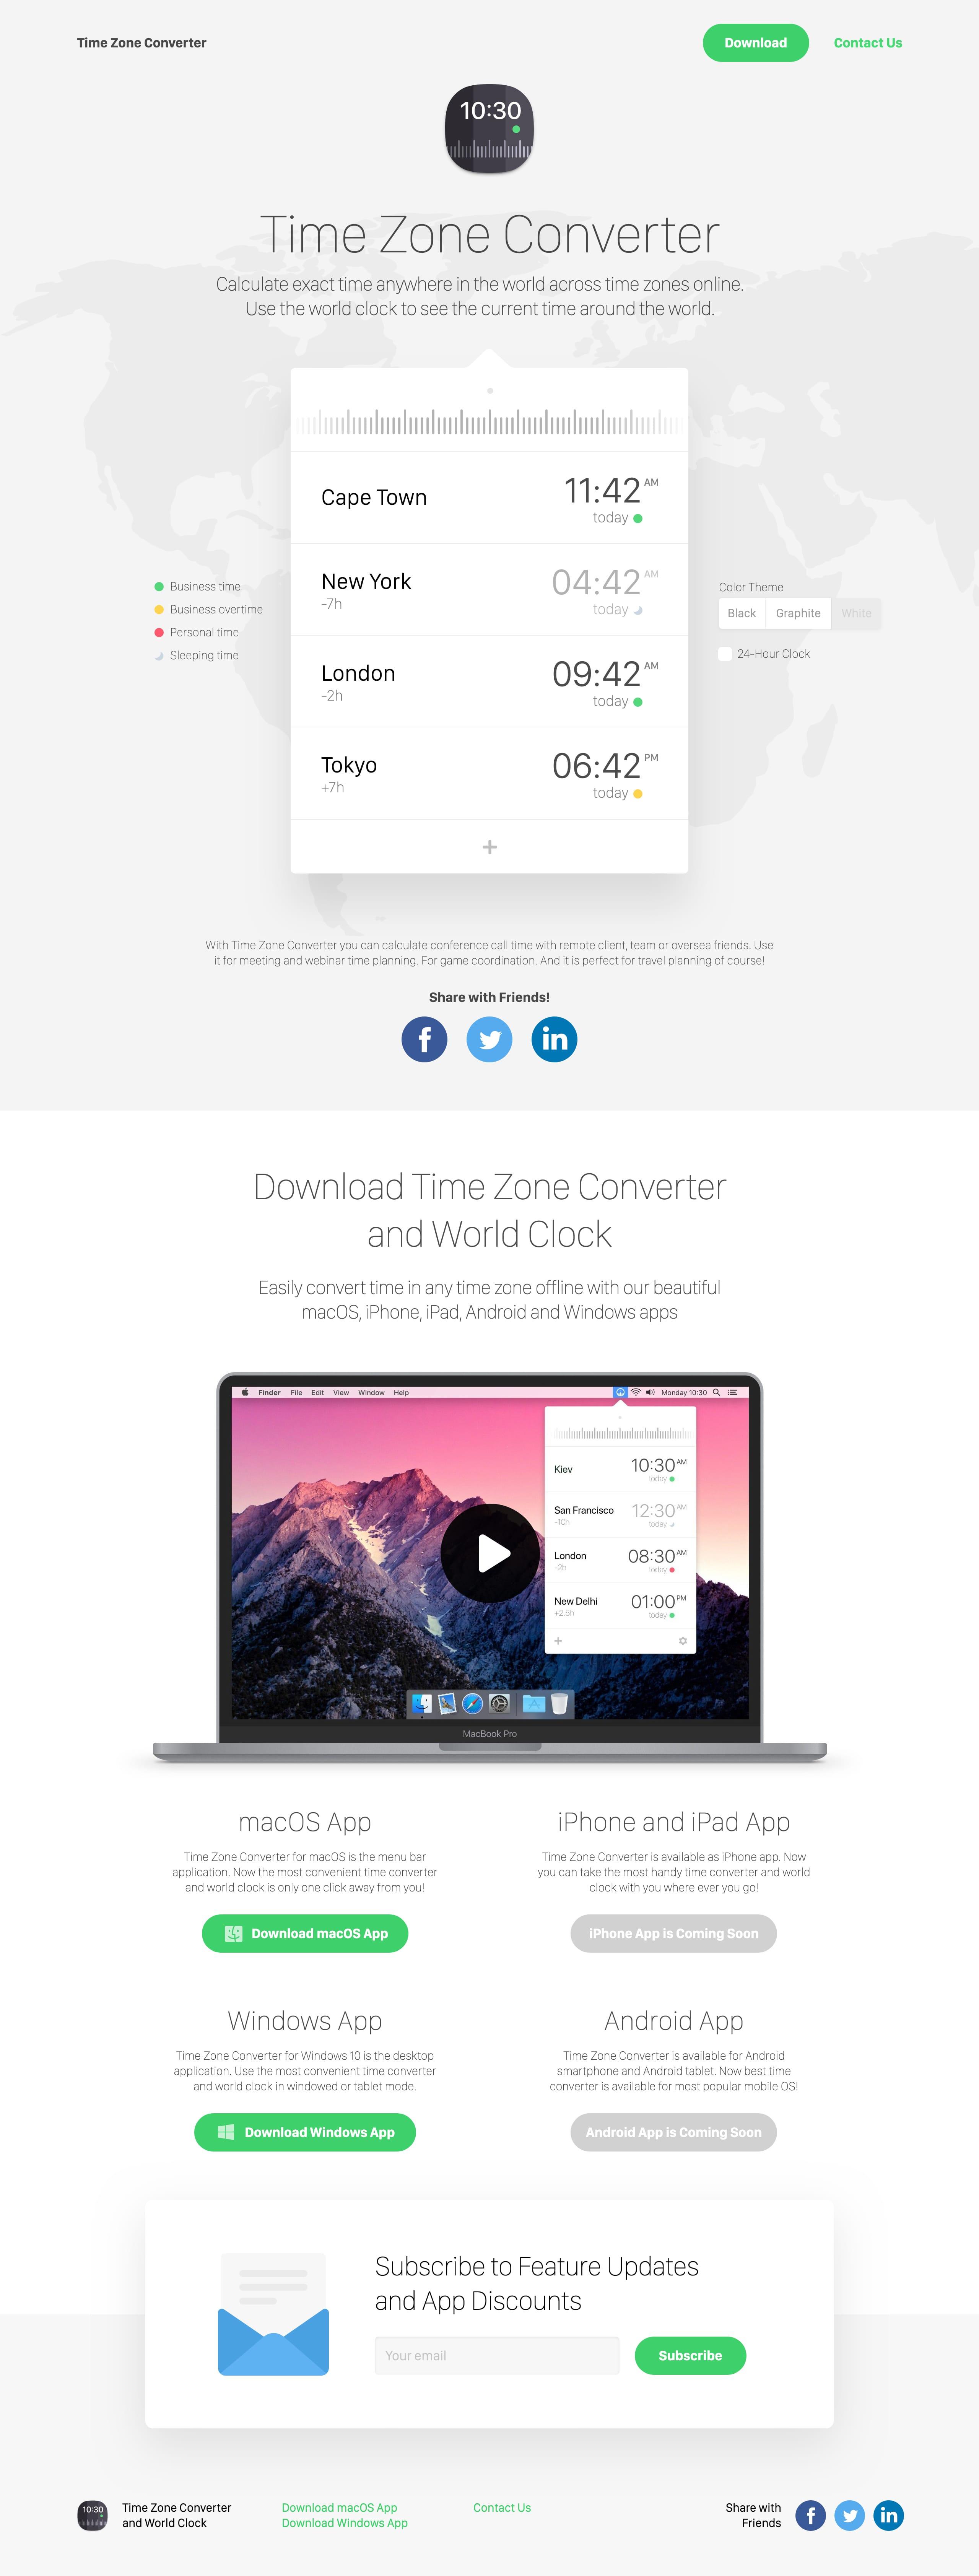 Time Zone Converter Website Screenshot